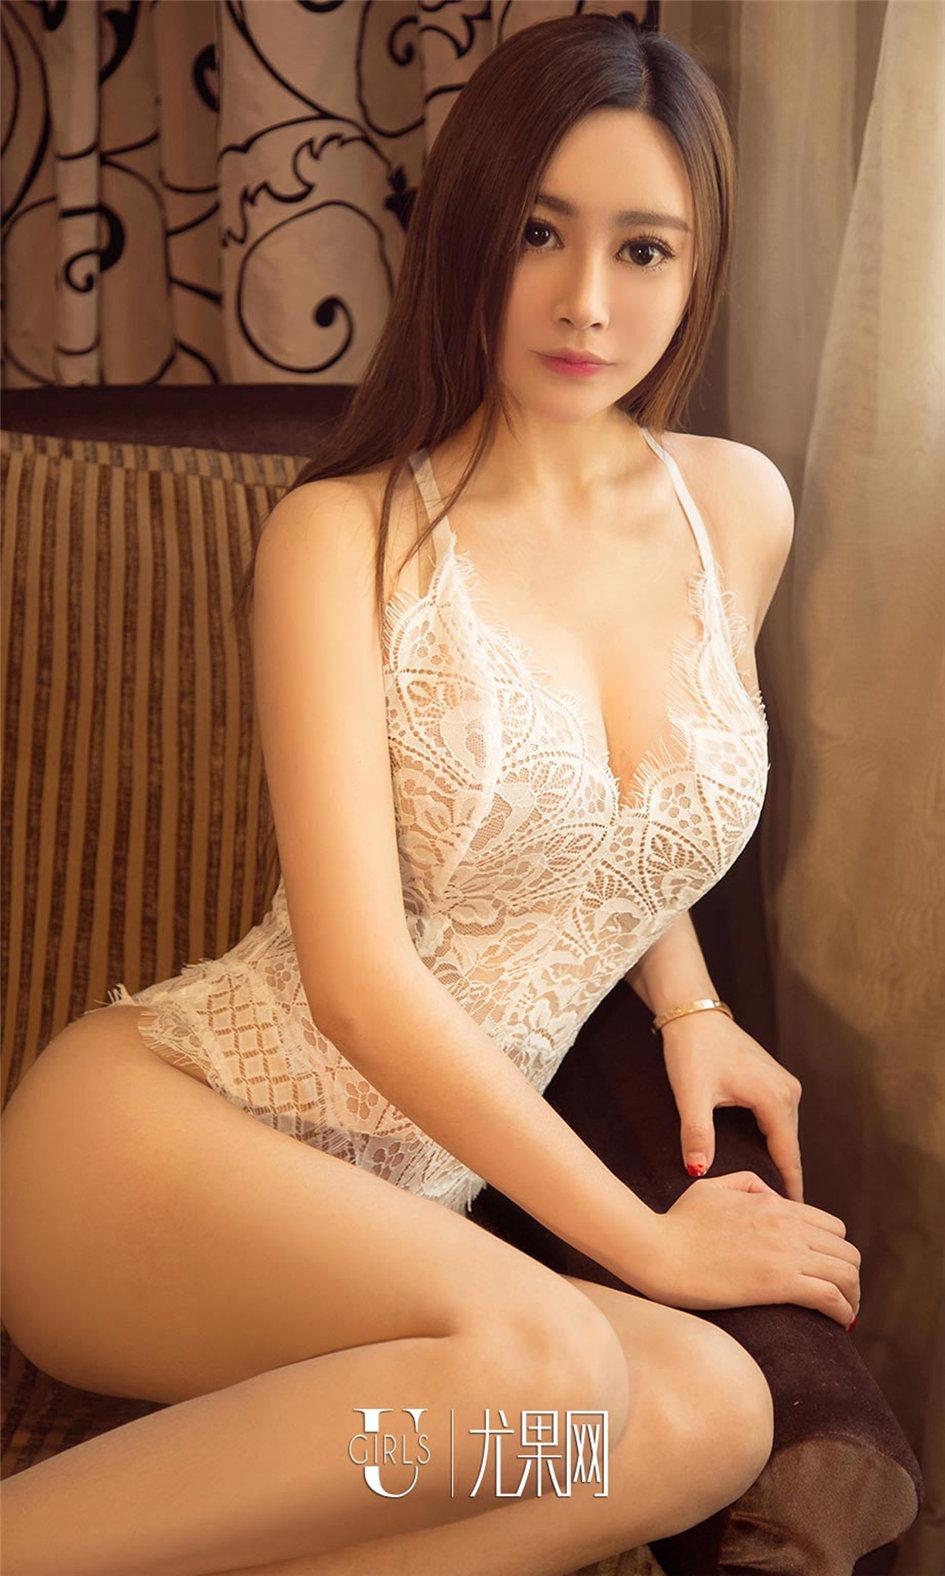 [ugirls尤果网] 气质清纯美女模特纳兰绝对走心写真图片